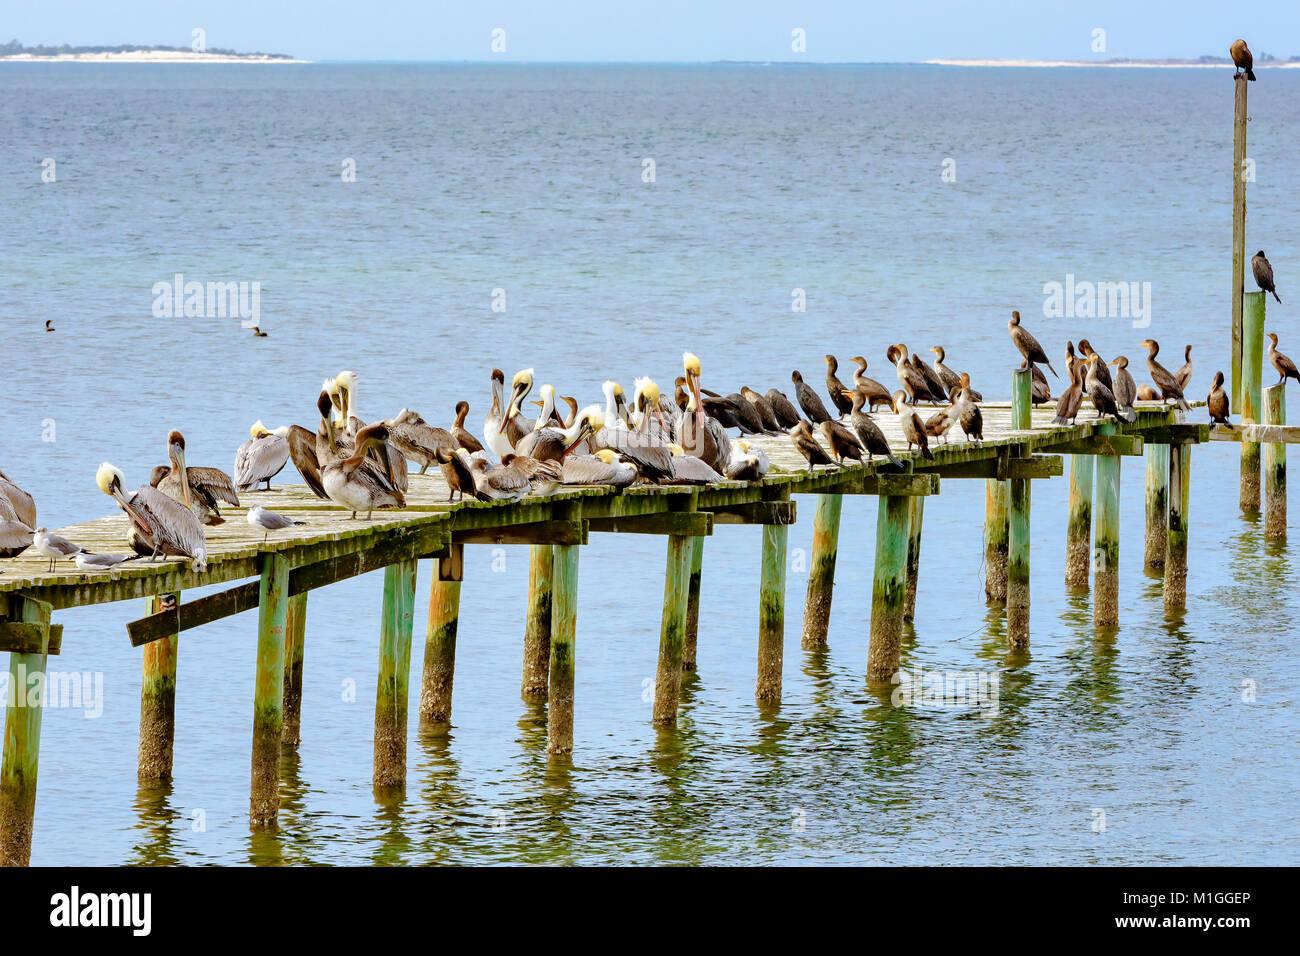 Pelicans Panama City Beach